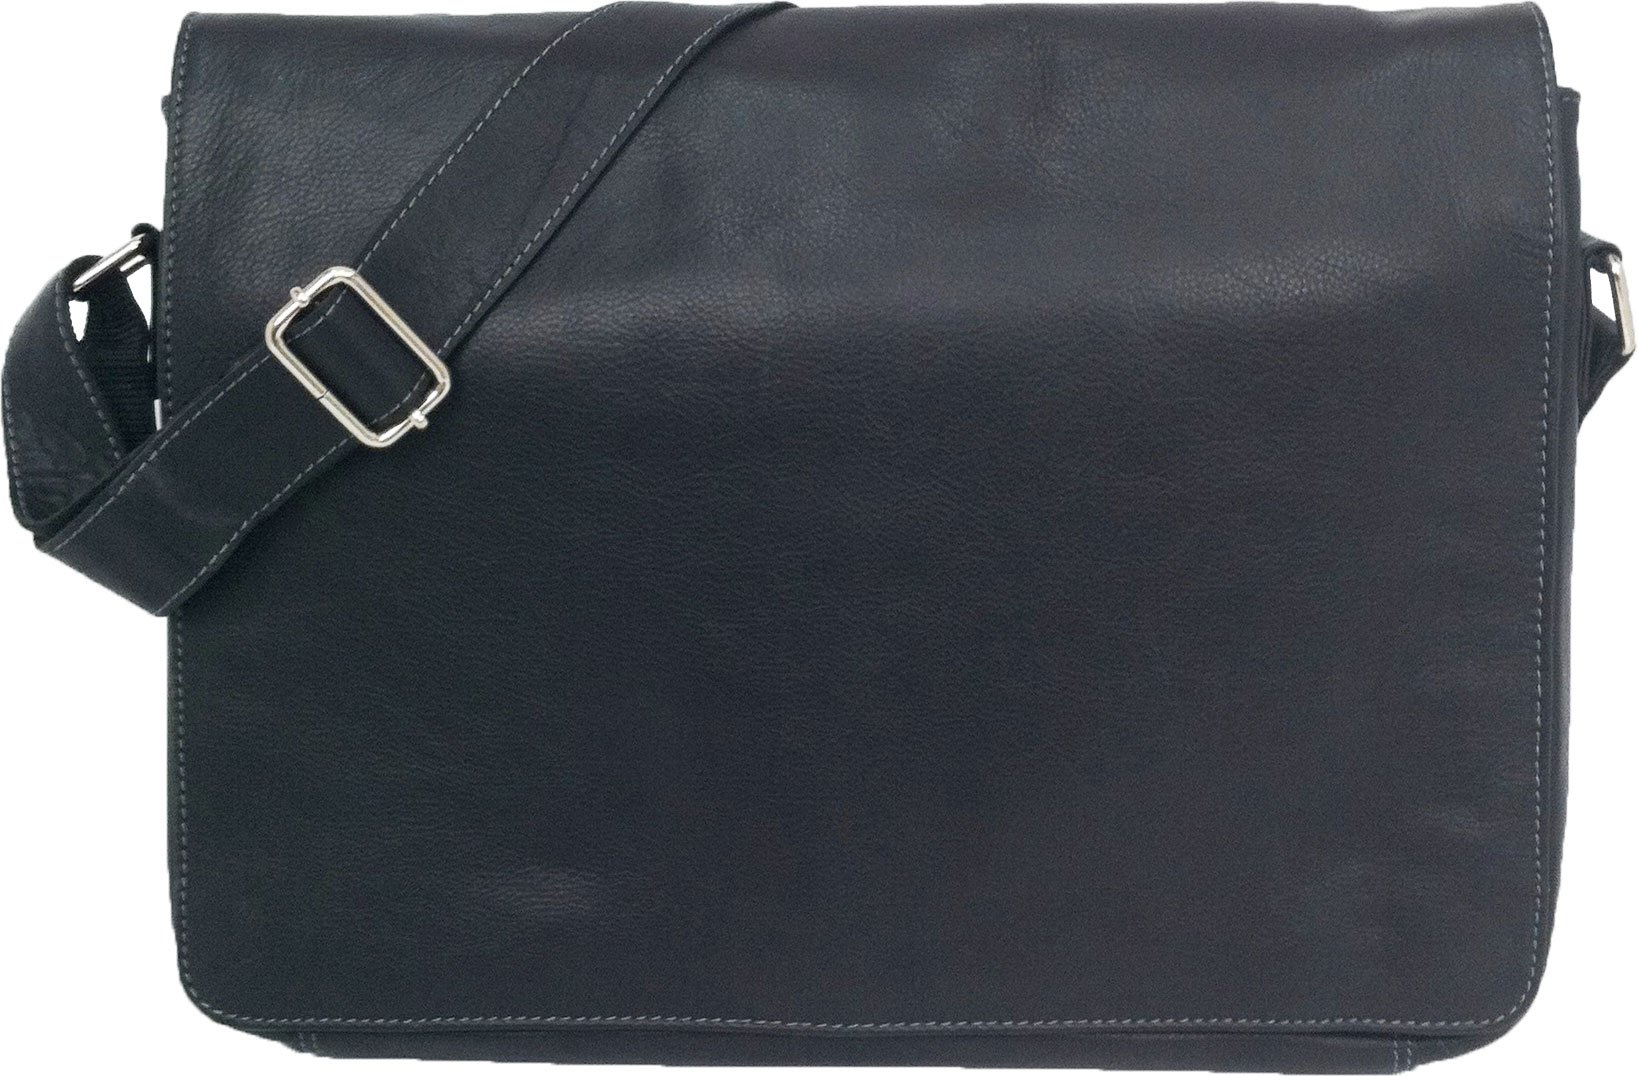 Unicorn Real Leather Black 16.4'' laptop bag Messenger #1L